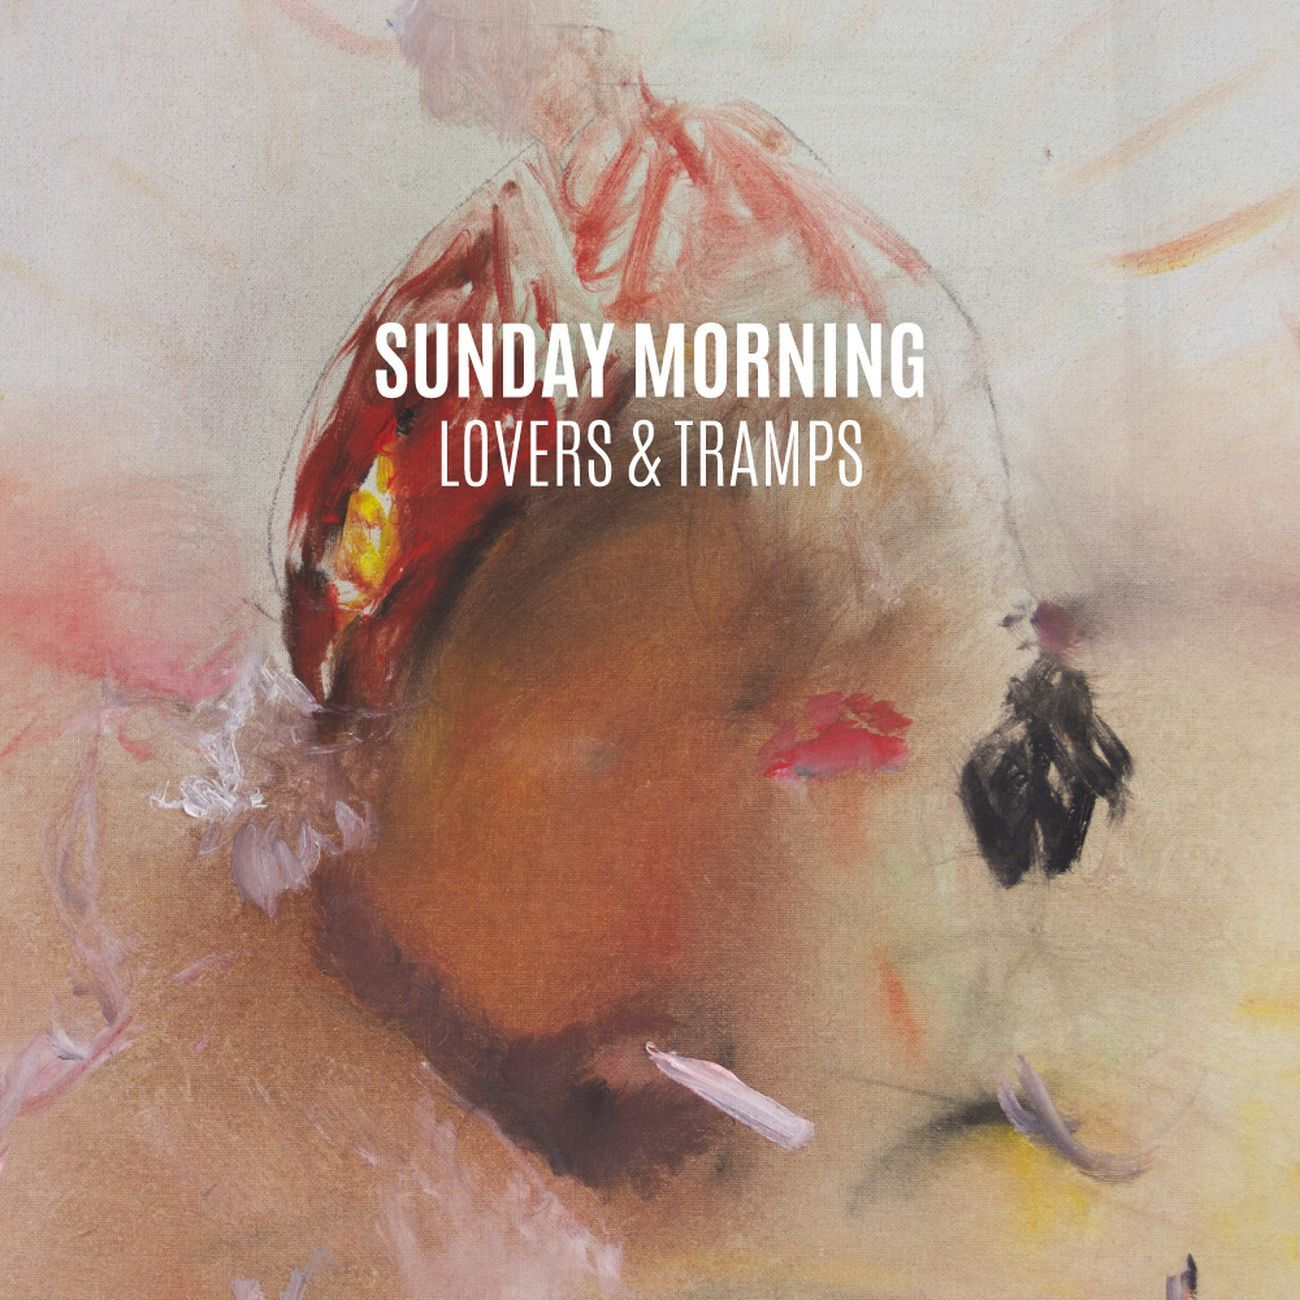 Sunday Morning, Lovers & Tramps, Bronson Recordings, copertina digitale singolo